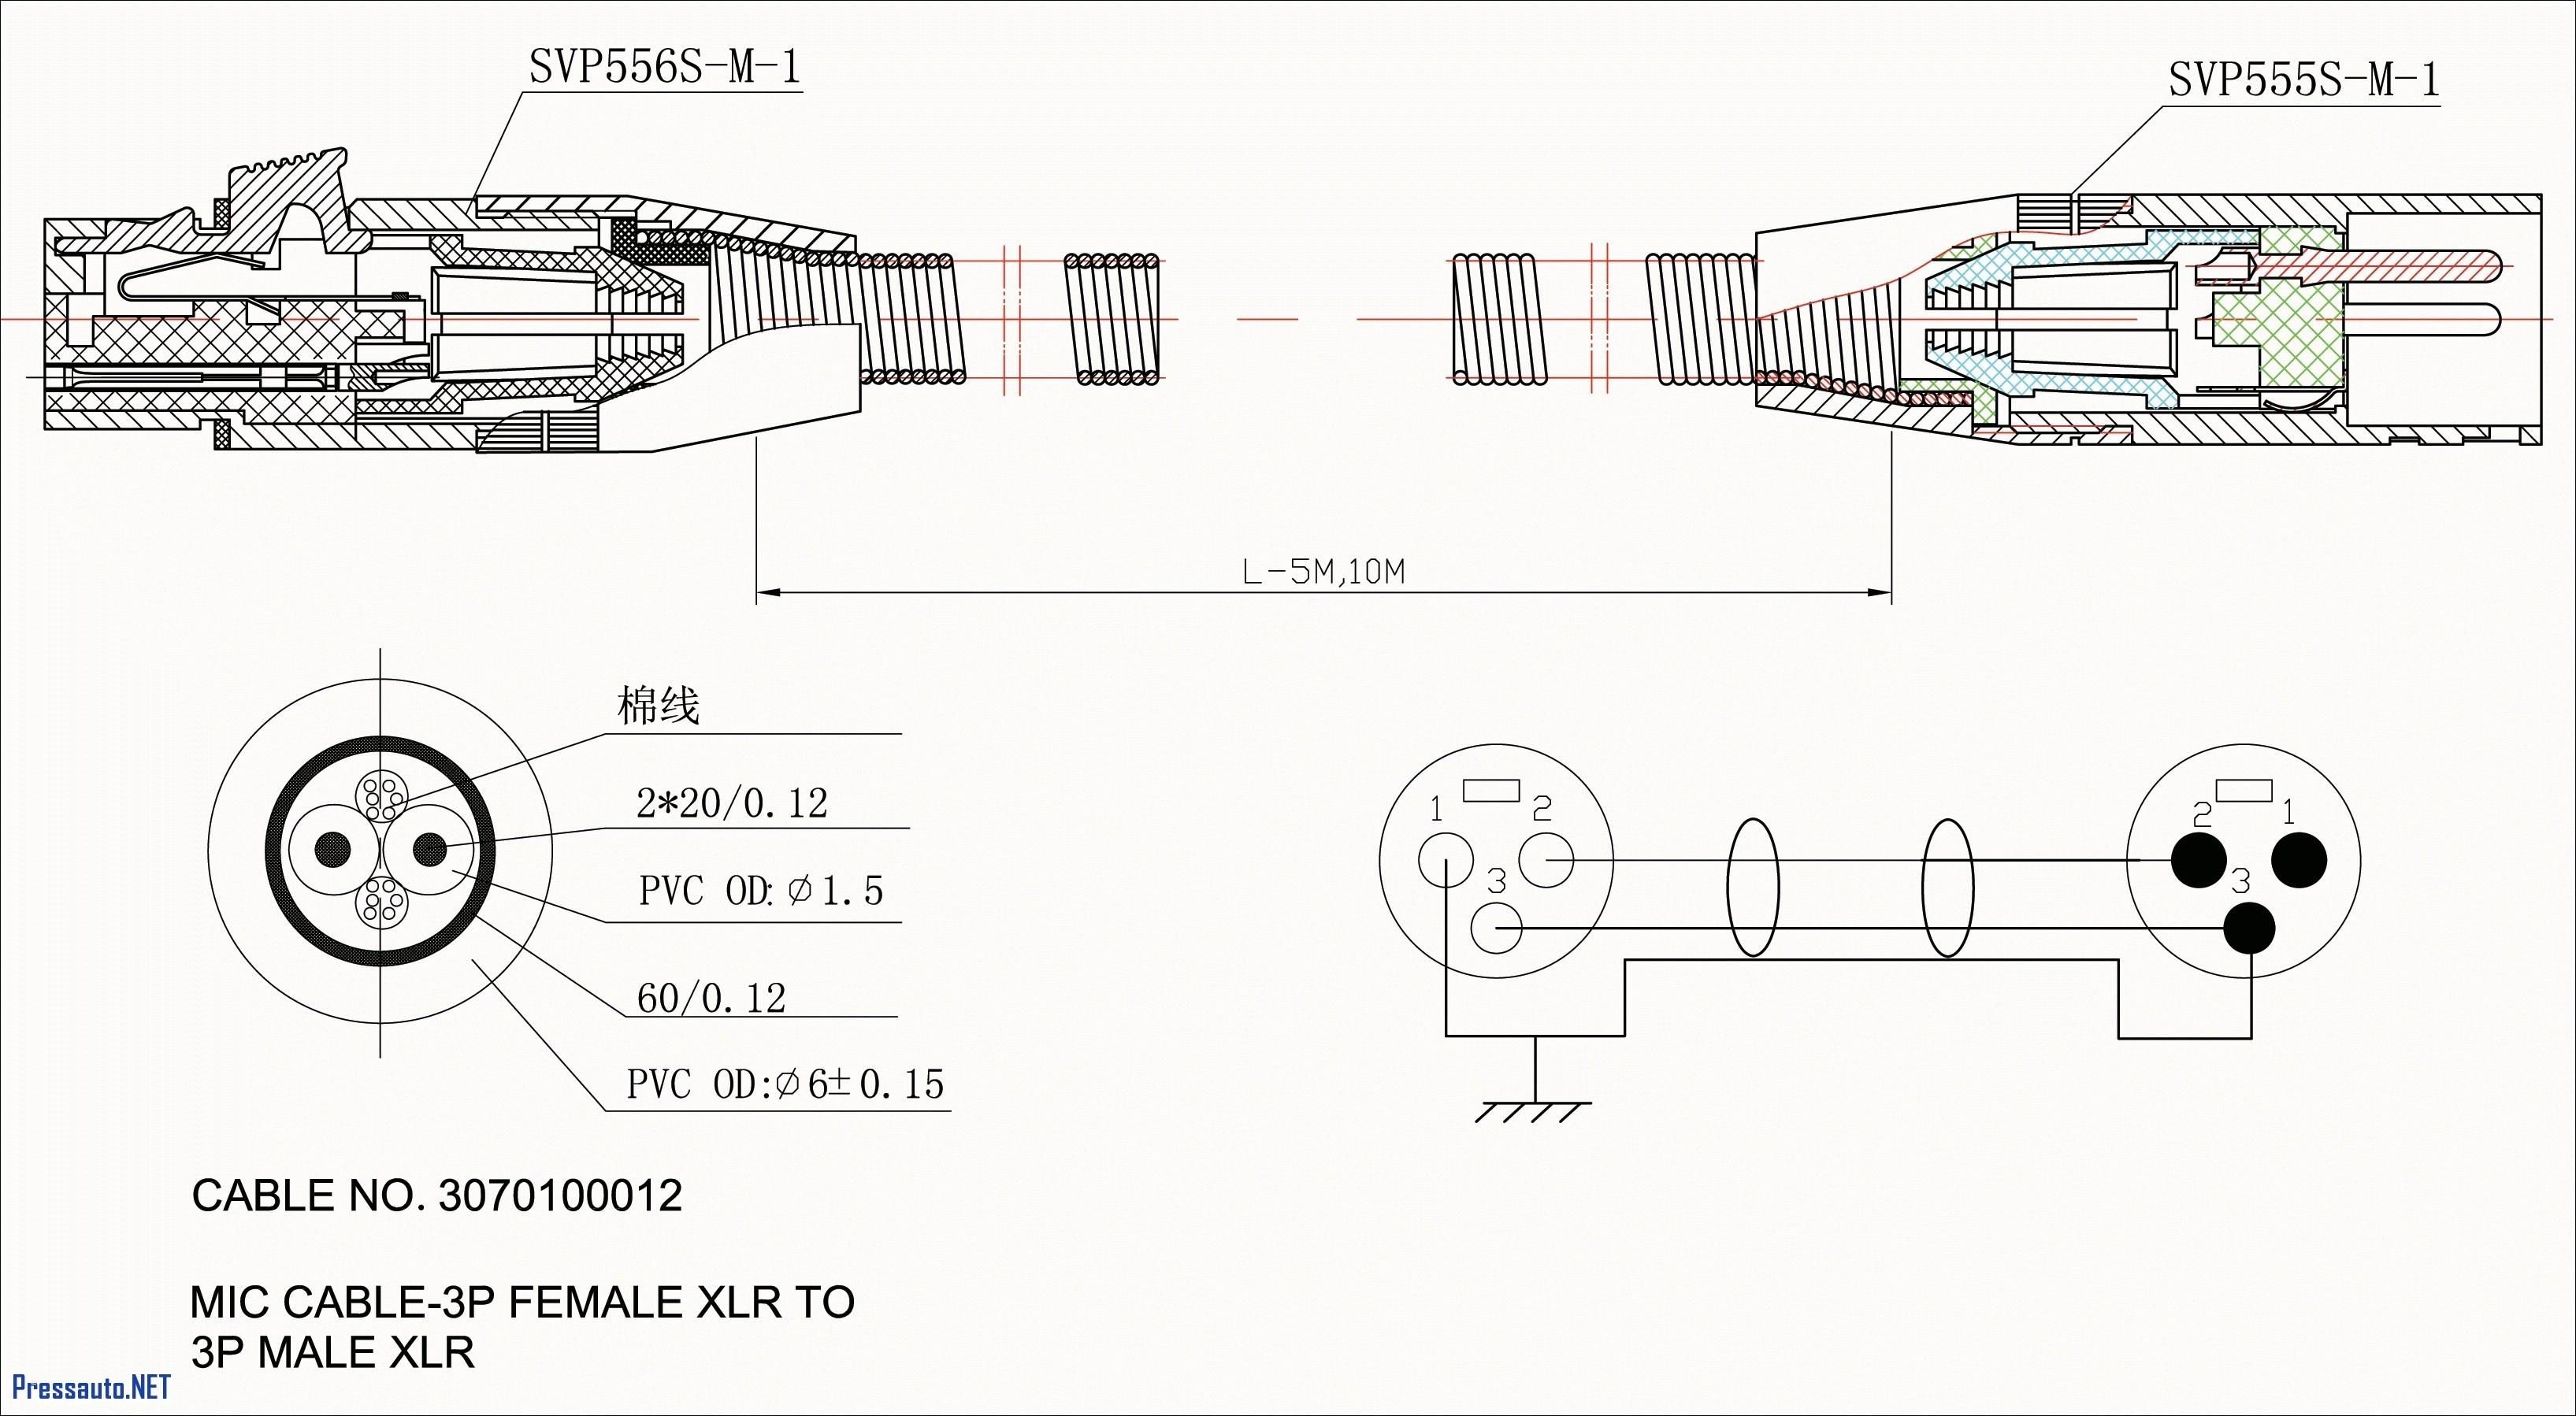 Klipsch Promedia 2 1 Wiring Diagram Elgrifo Page 12 Of 61 Extention Wiring Diagram Of Klipsch Promedia 2 1 Wiring Diagram